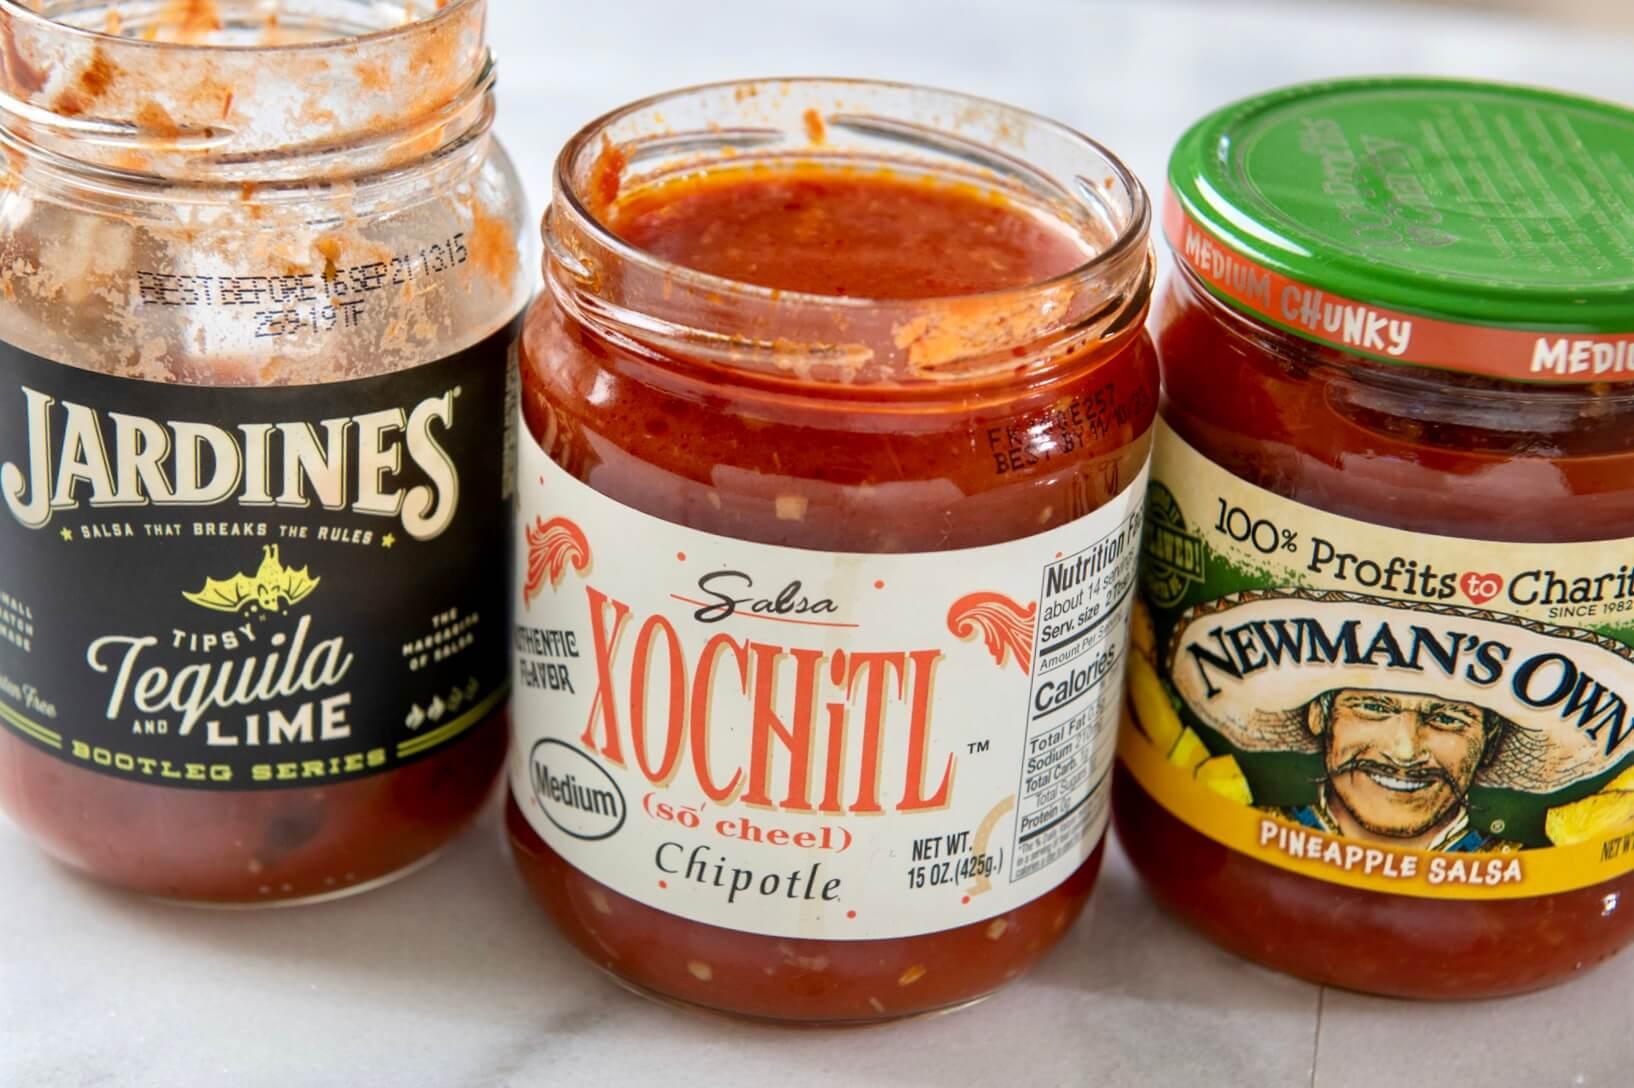 Salsa serves as a base for the easy, customizable sauce.